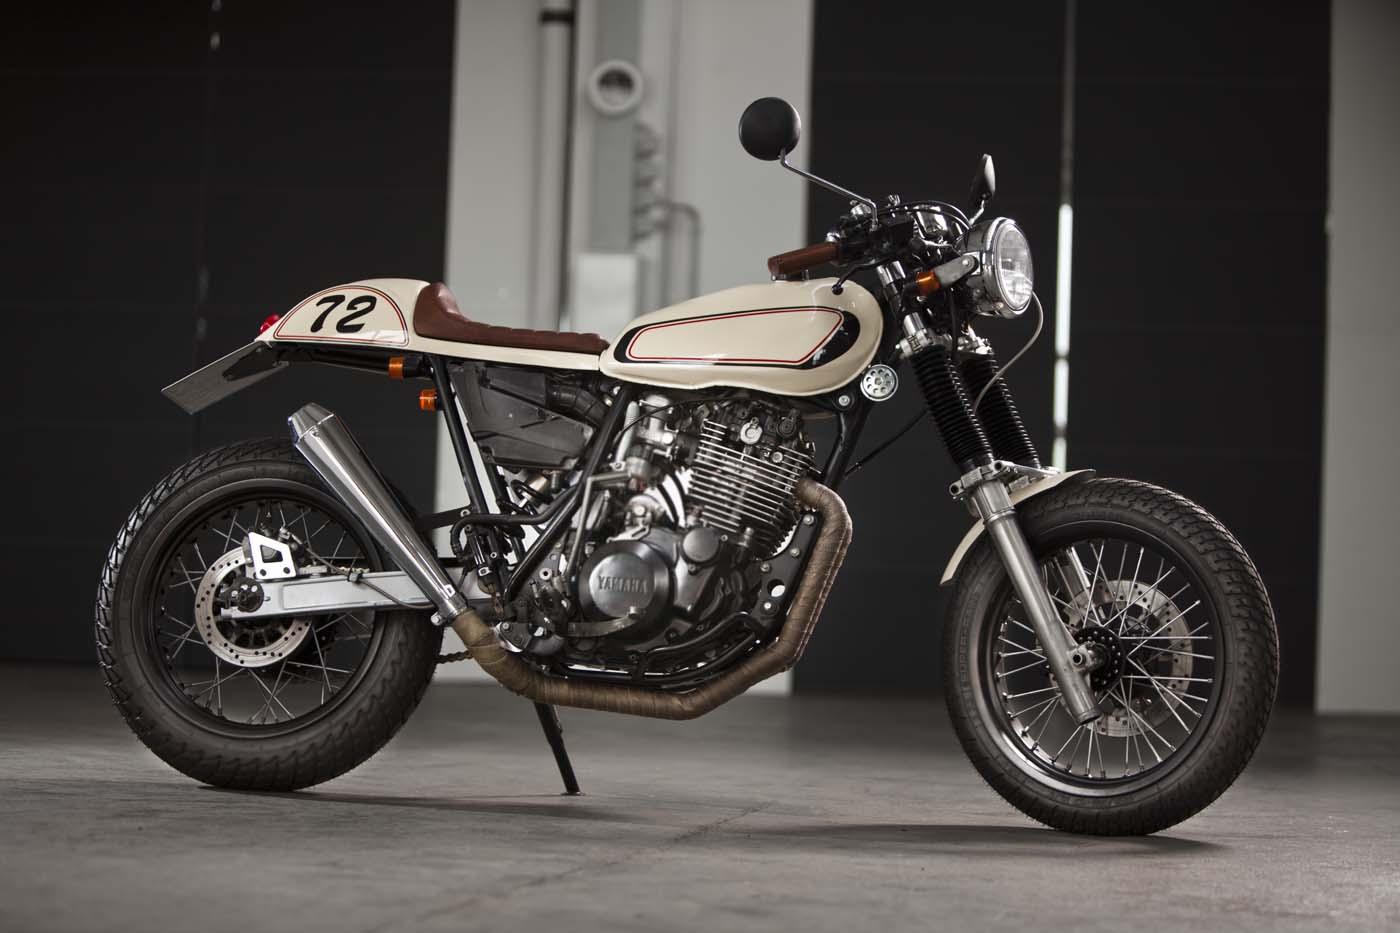 Yamaha Xte Cafe Racer